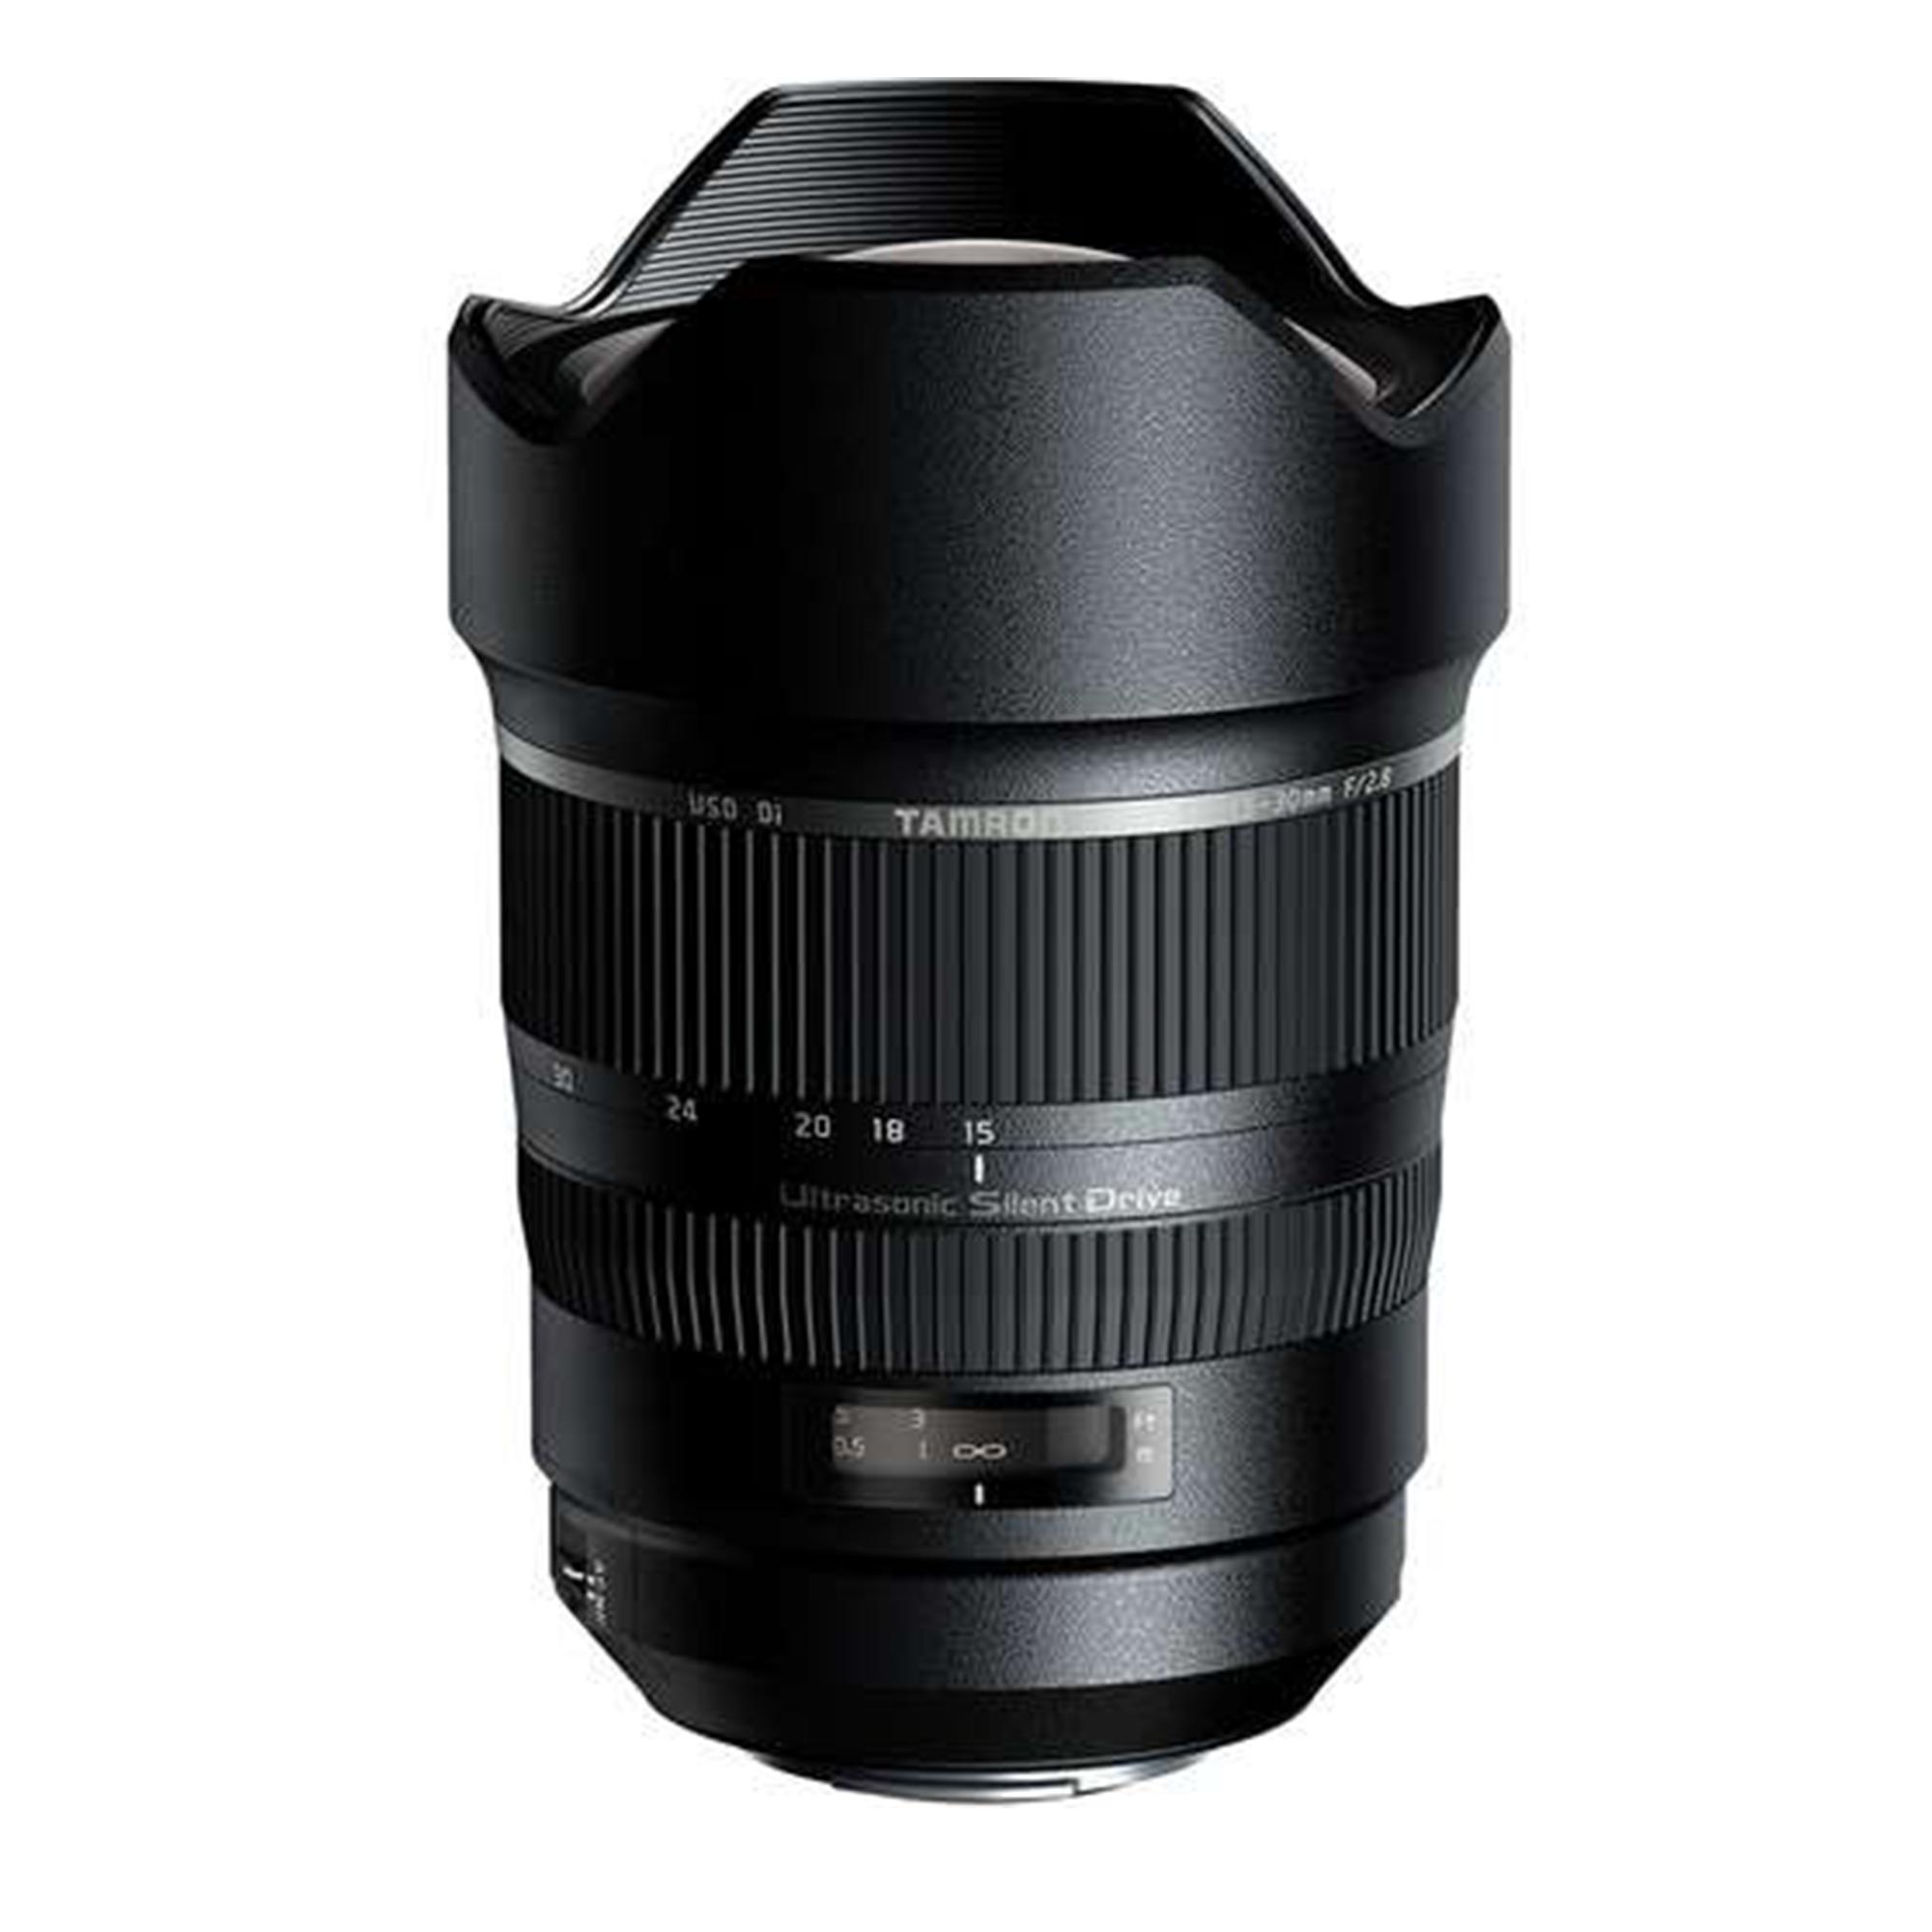 Tamron SP 15-30mm f / 2.8 Di VC USD Lens for Nikon